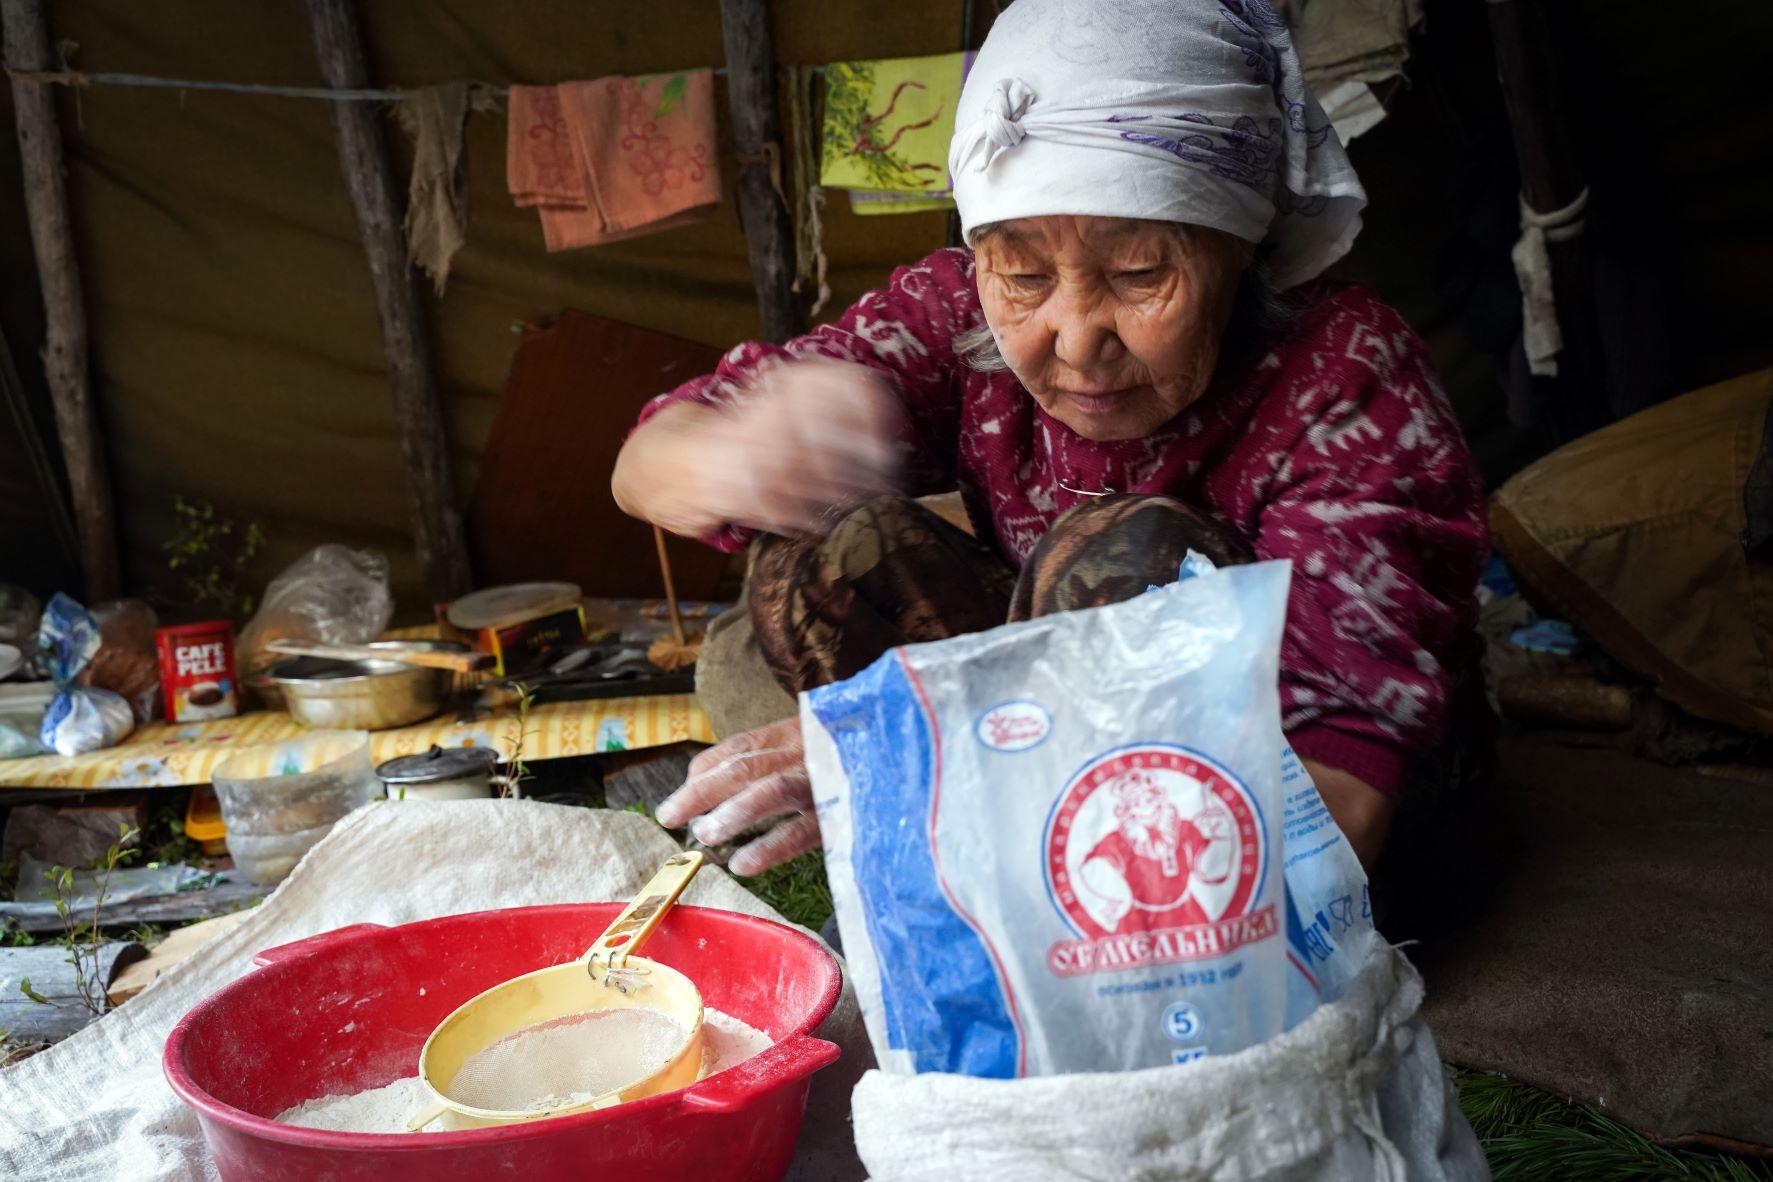 Мария Лазаревна стряпает хлеб